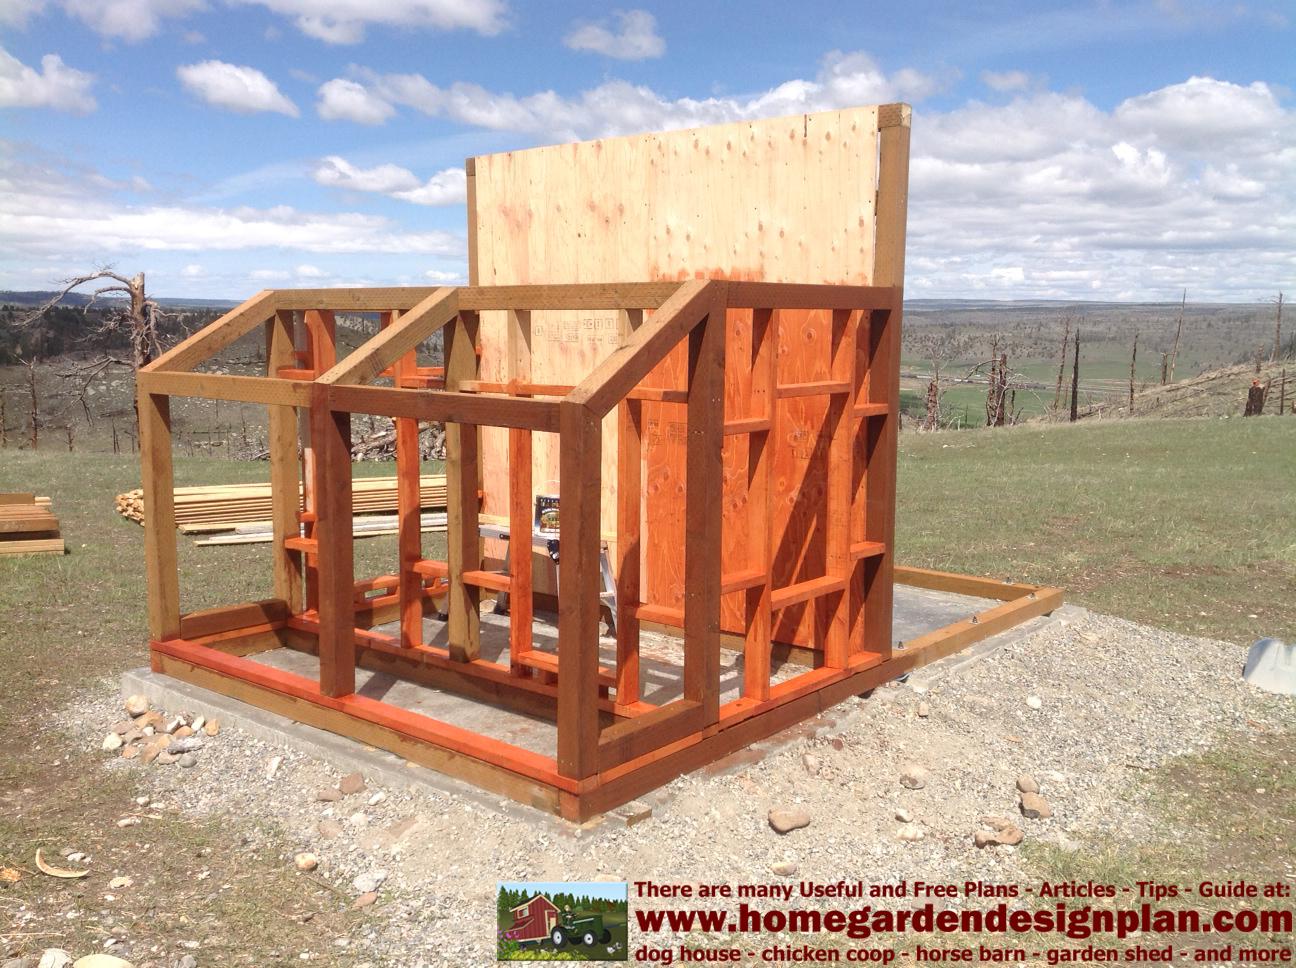 home garden plans CB100 Building Success Combo